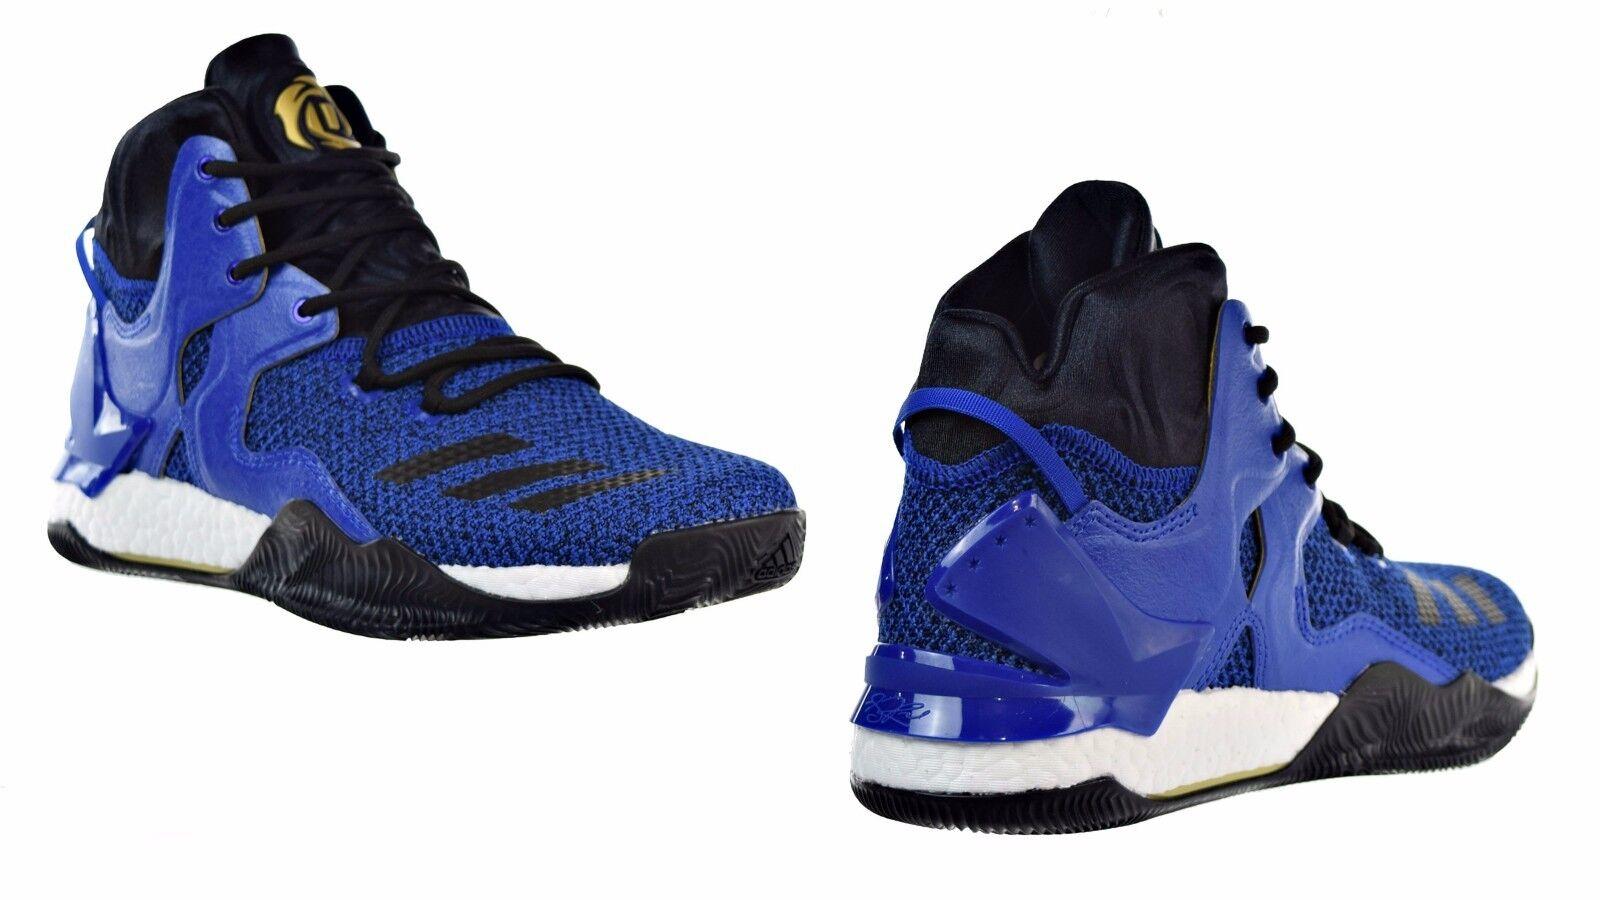 Men's Adidas Originals D Rose Blue Solid/Black/Metallic Gold BB8290